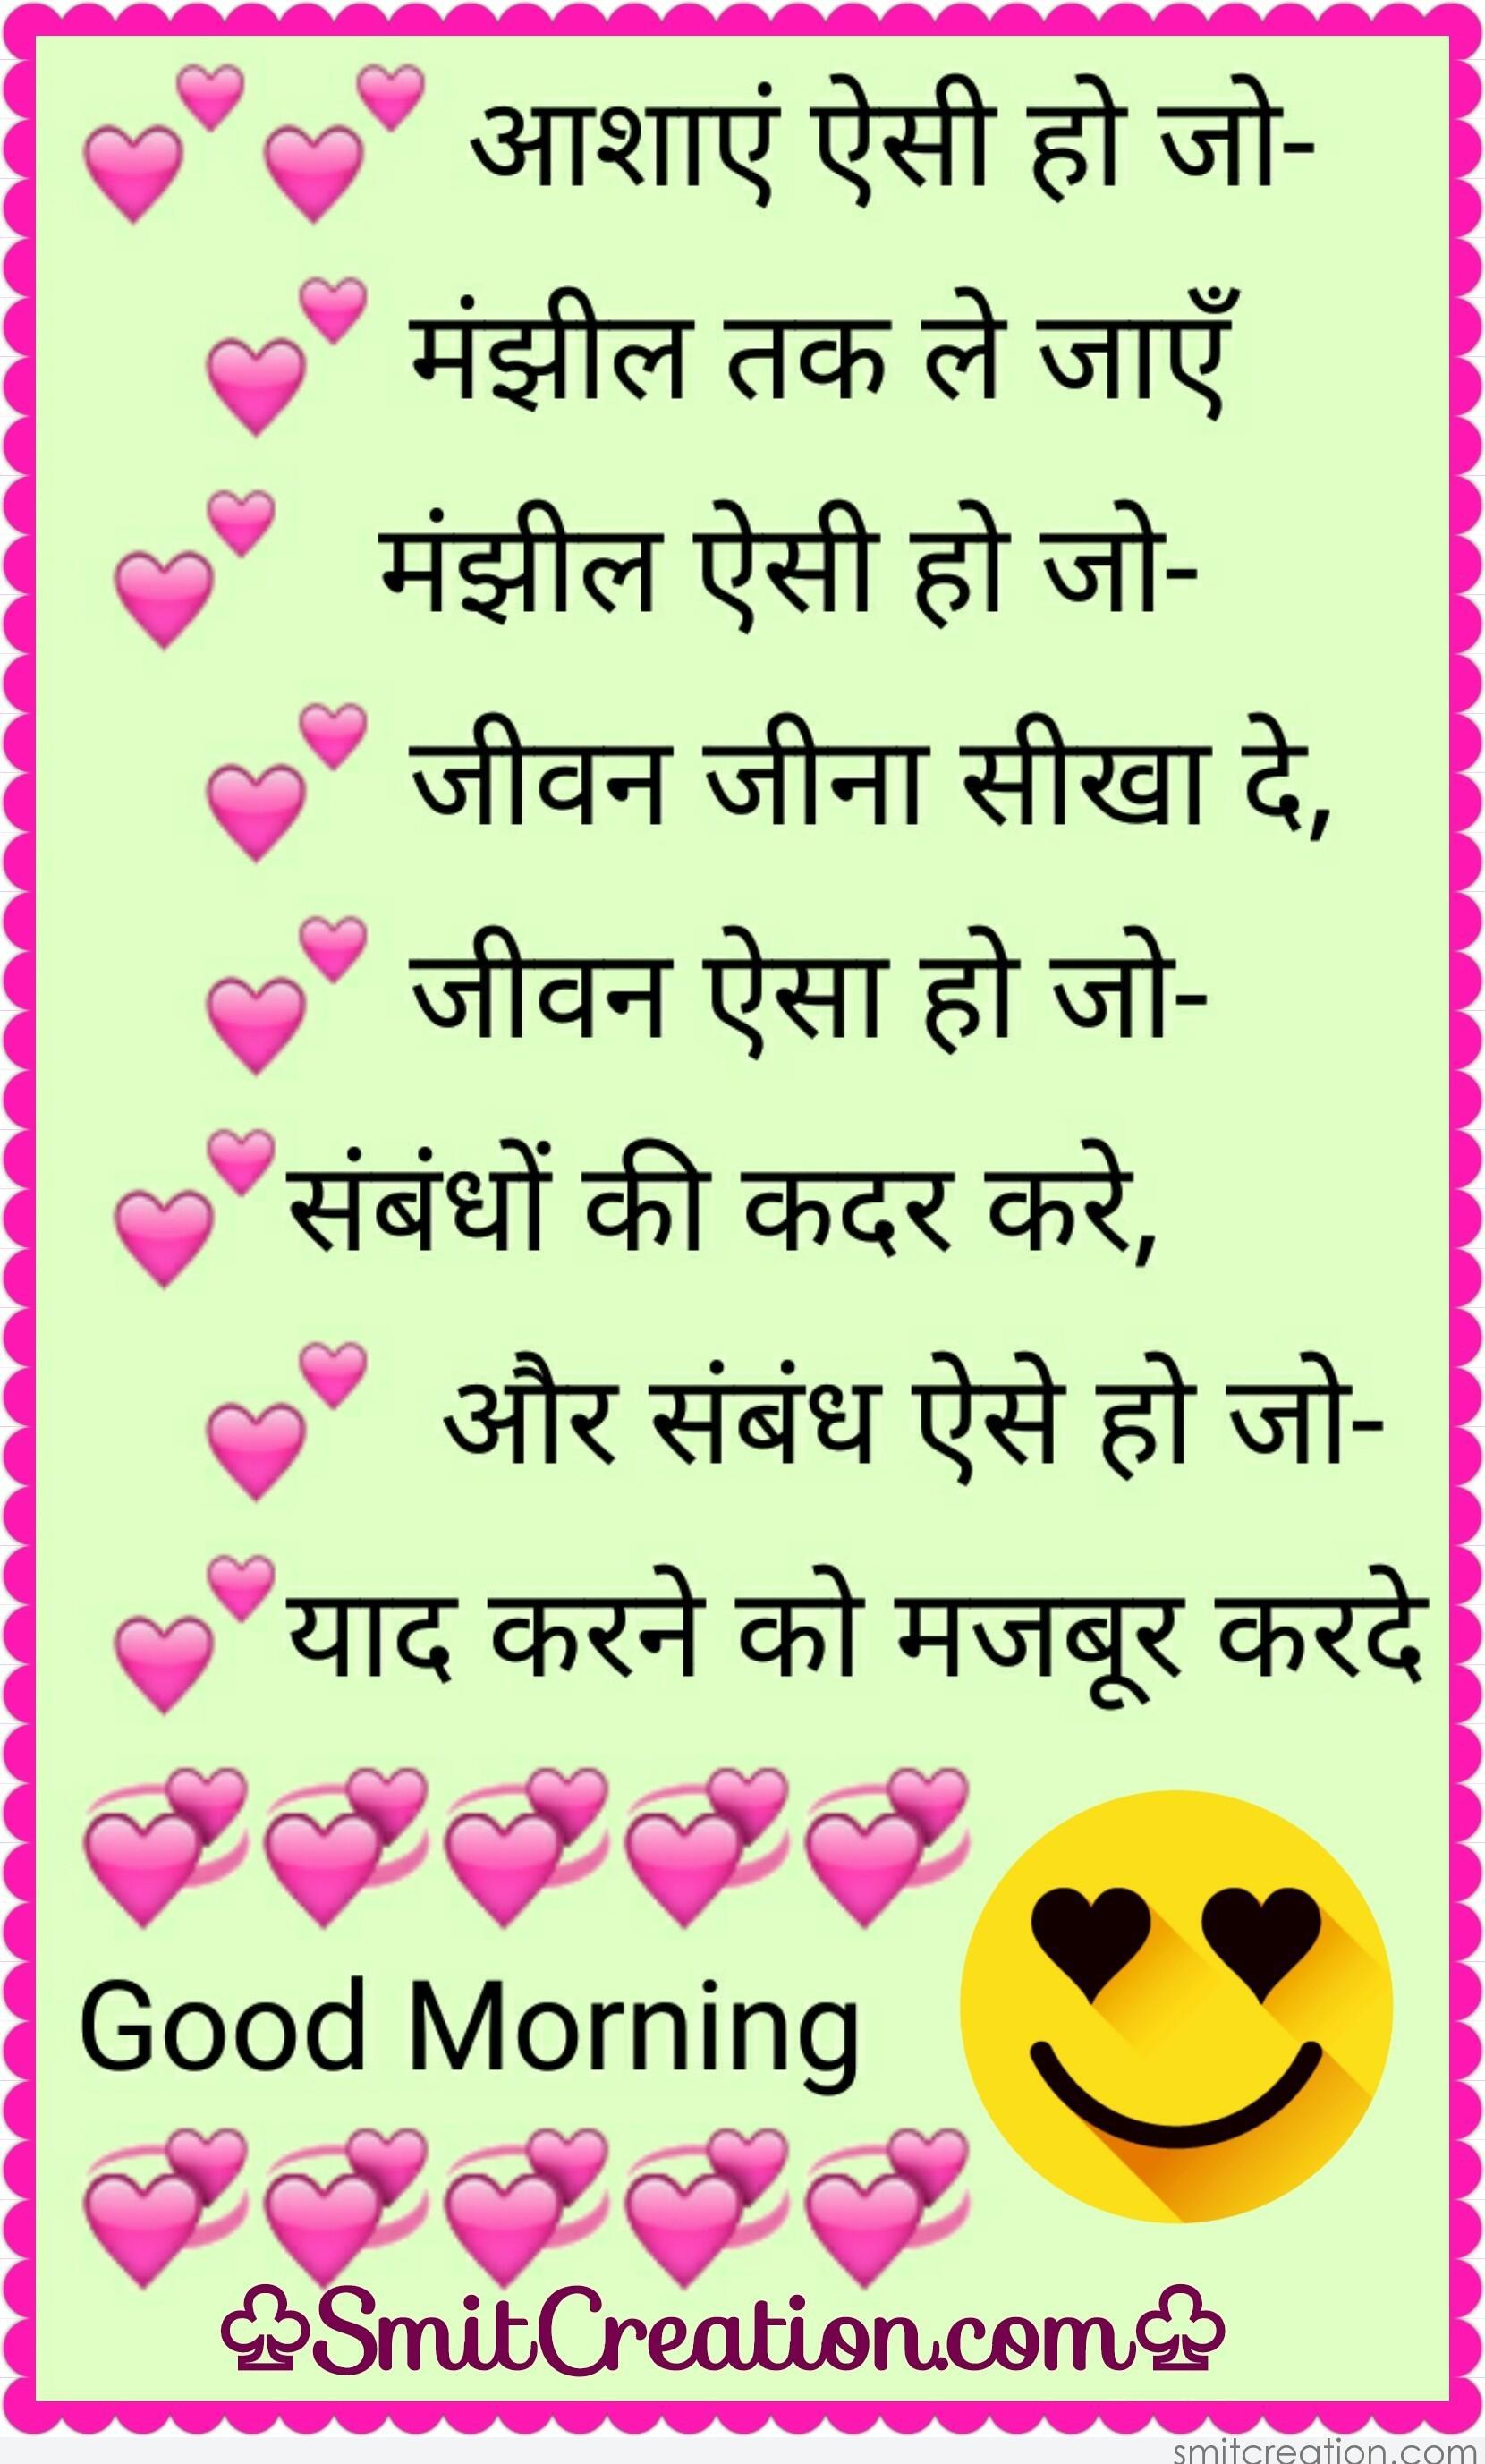 Good Morning Quotes Quora : Good morning sunday images in hindi pixshark